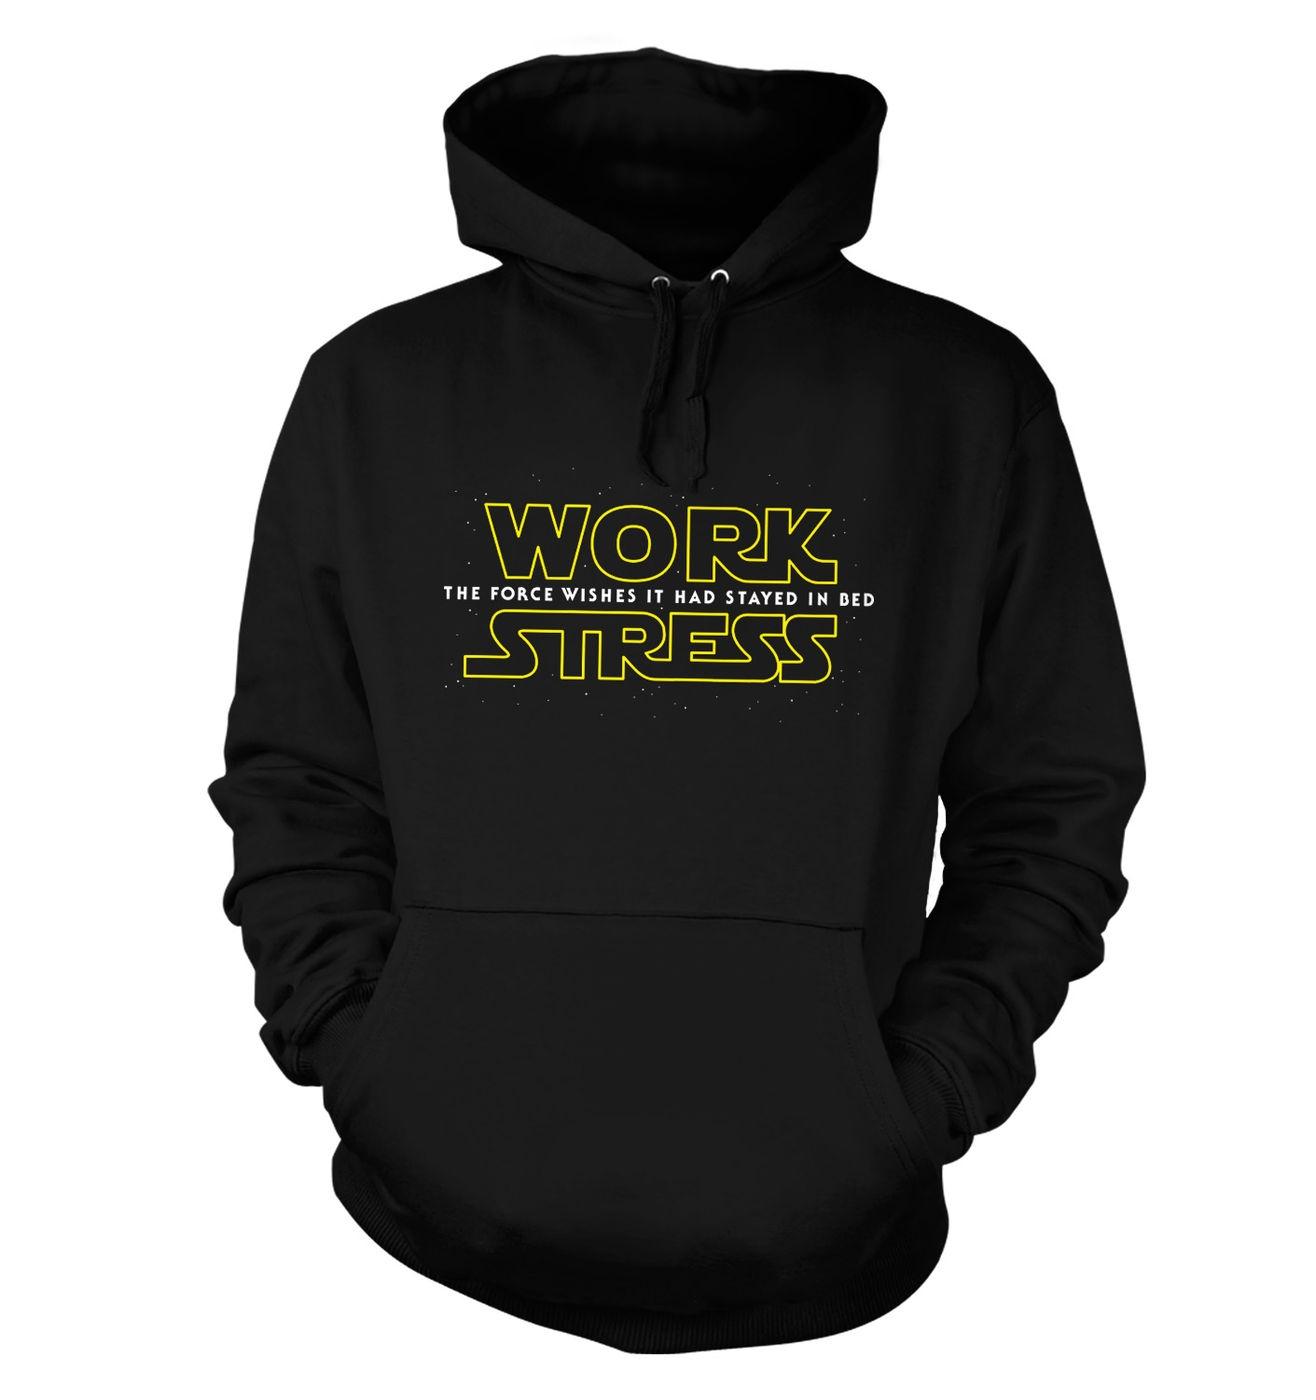 Work Stress hoodie - funny Star Wars The Force Awakens parody hoody